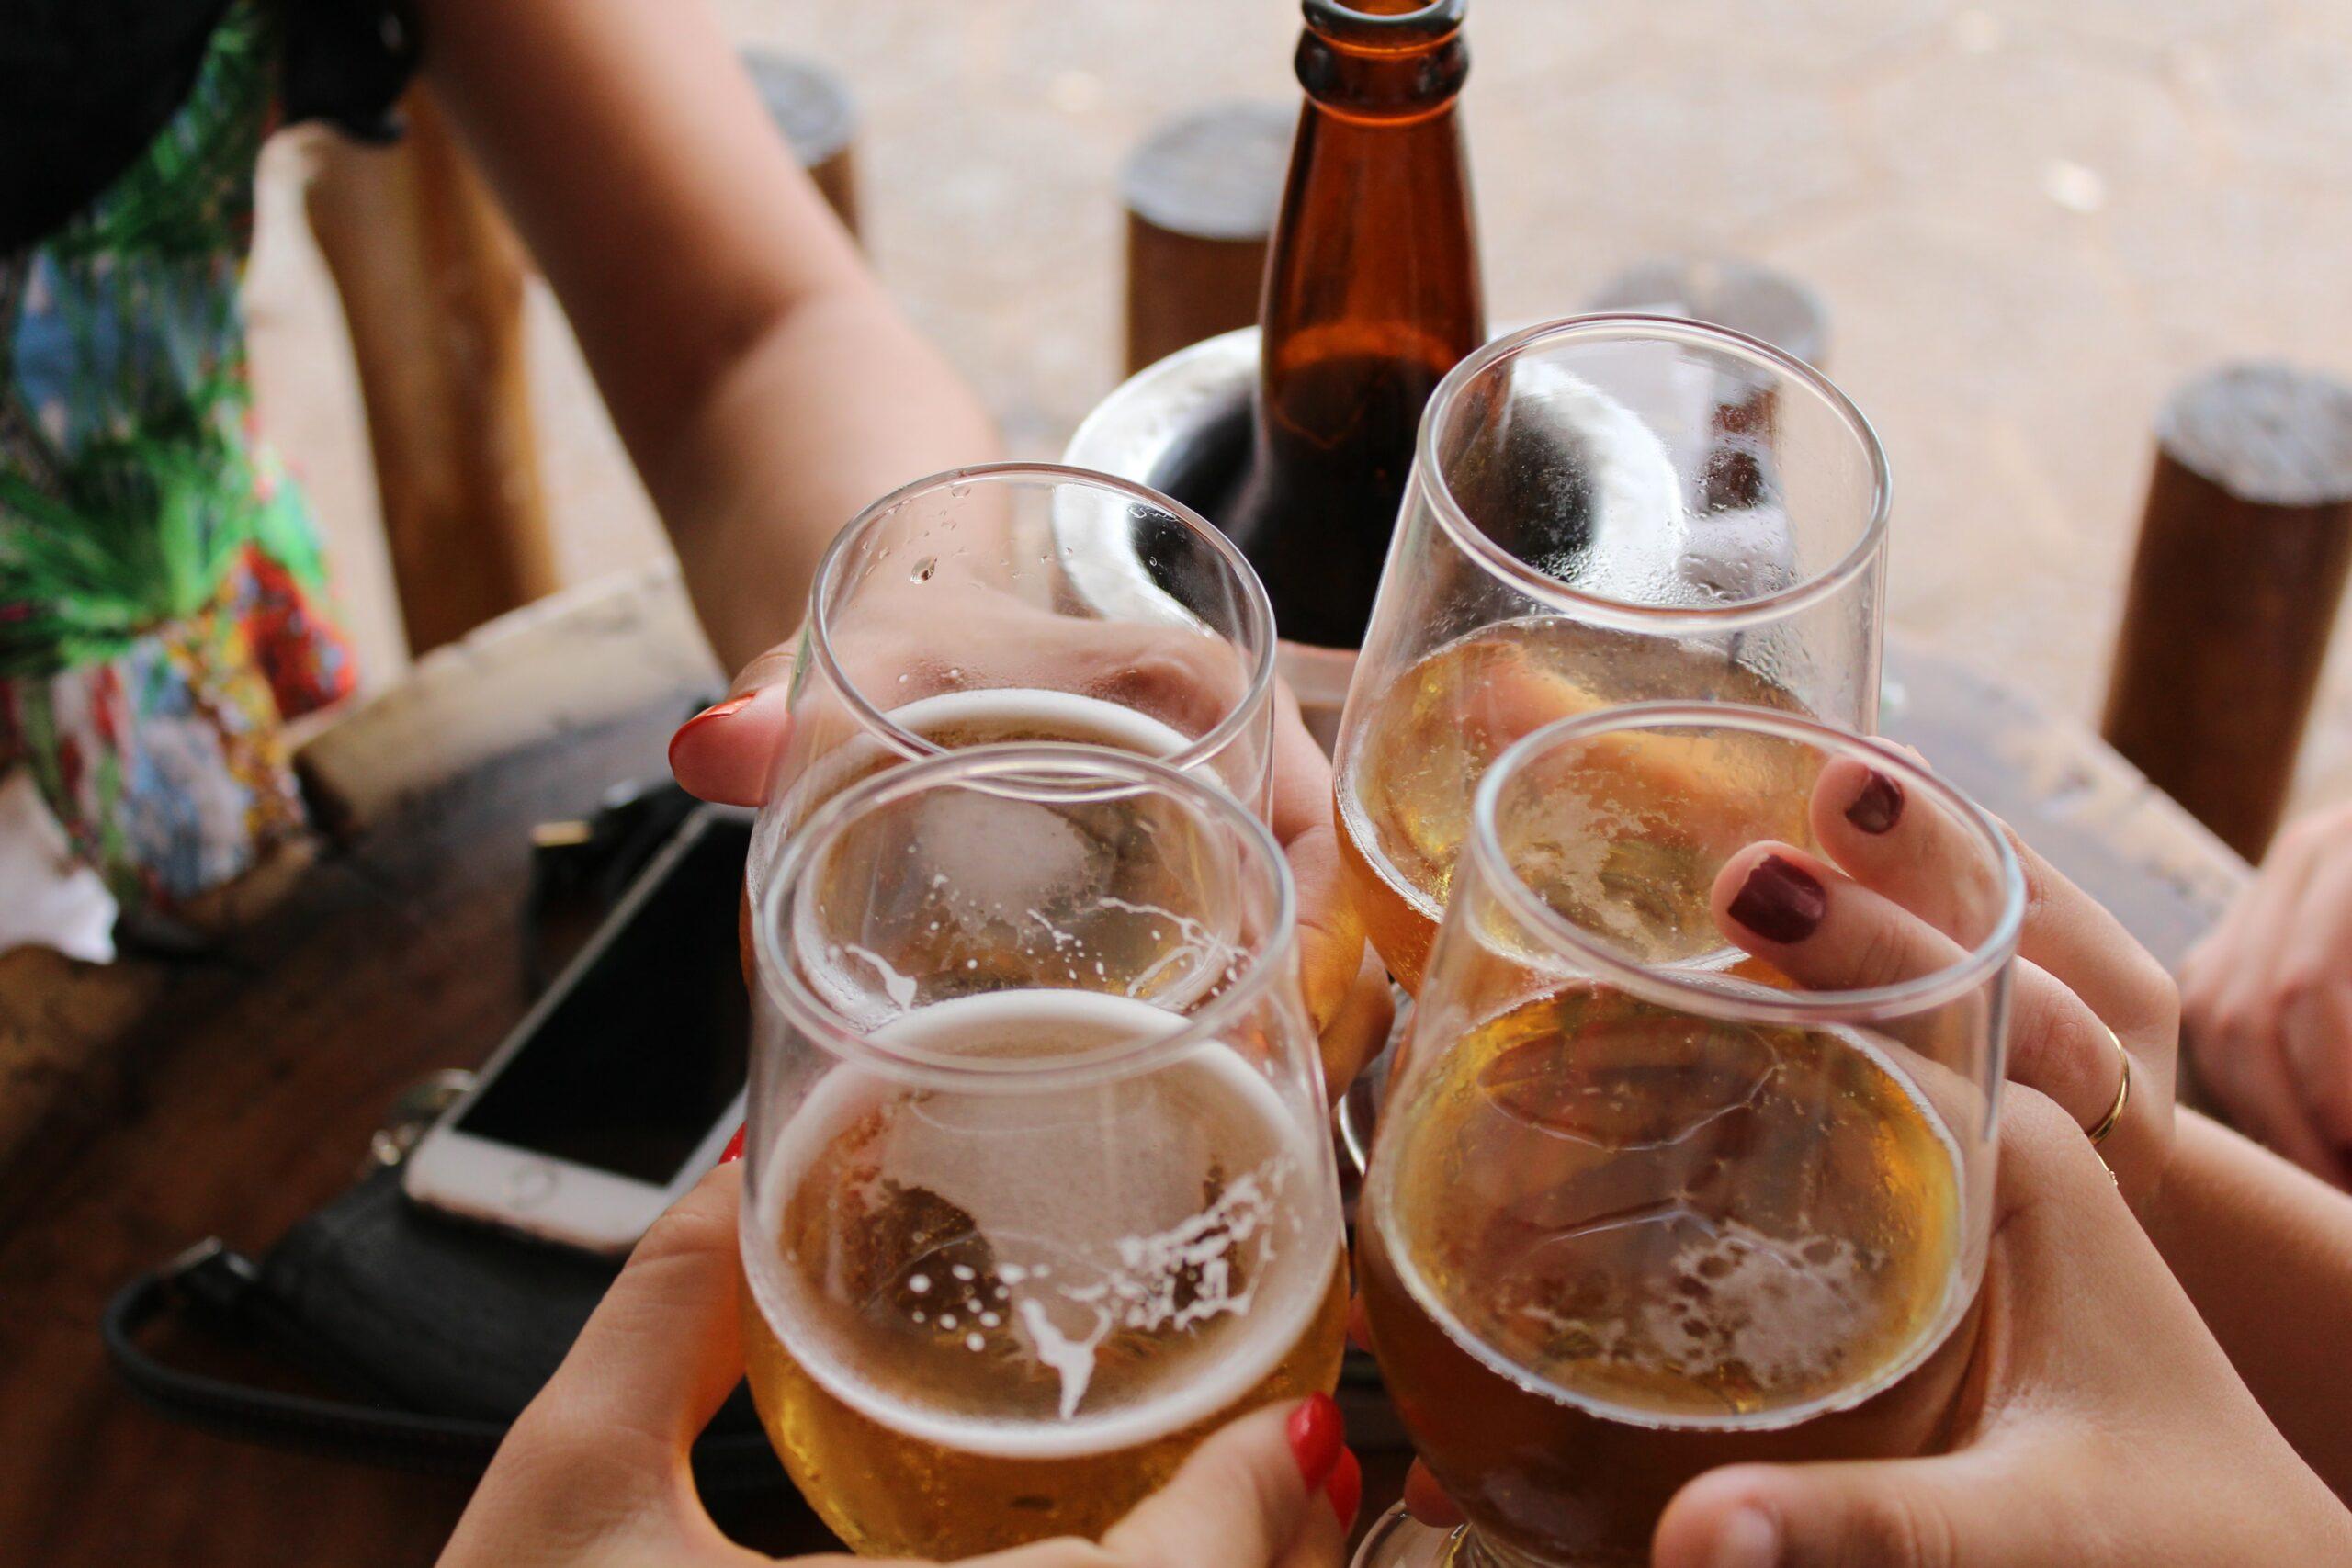 People holding beer glasses together